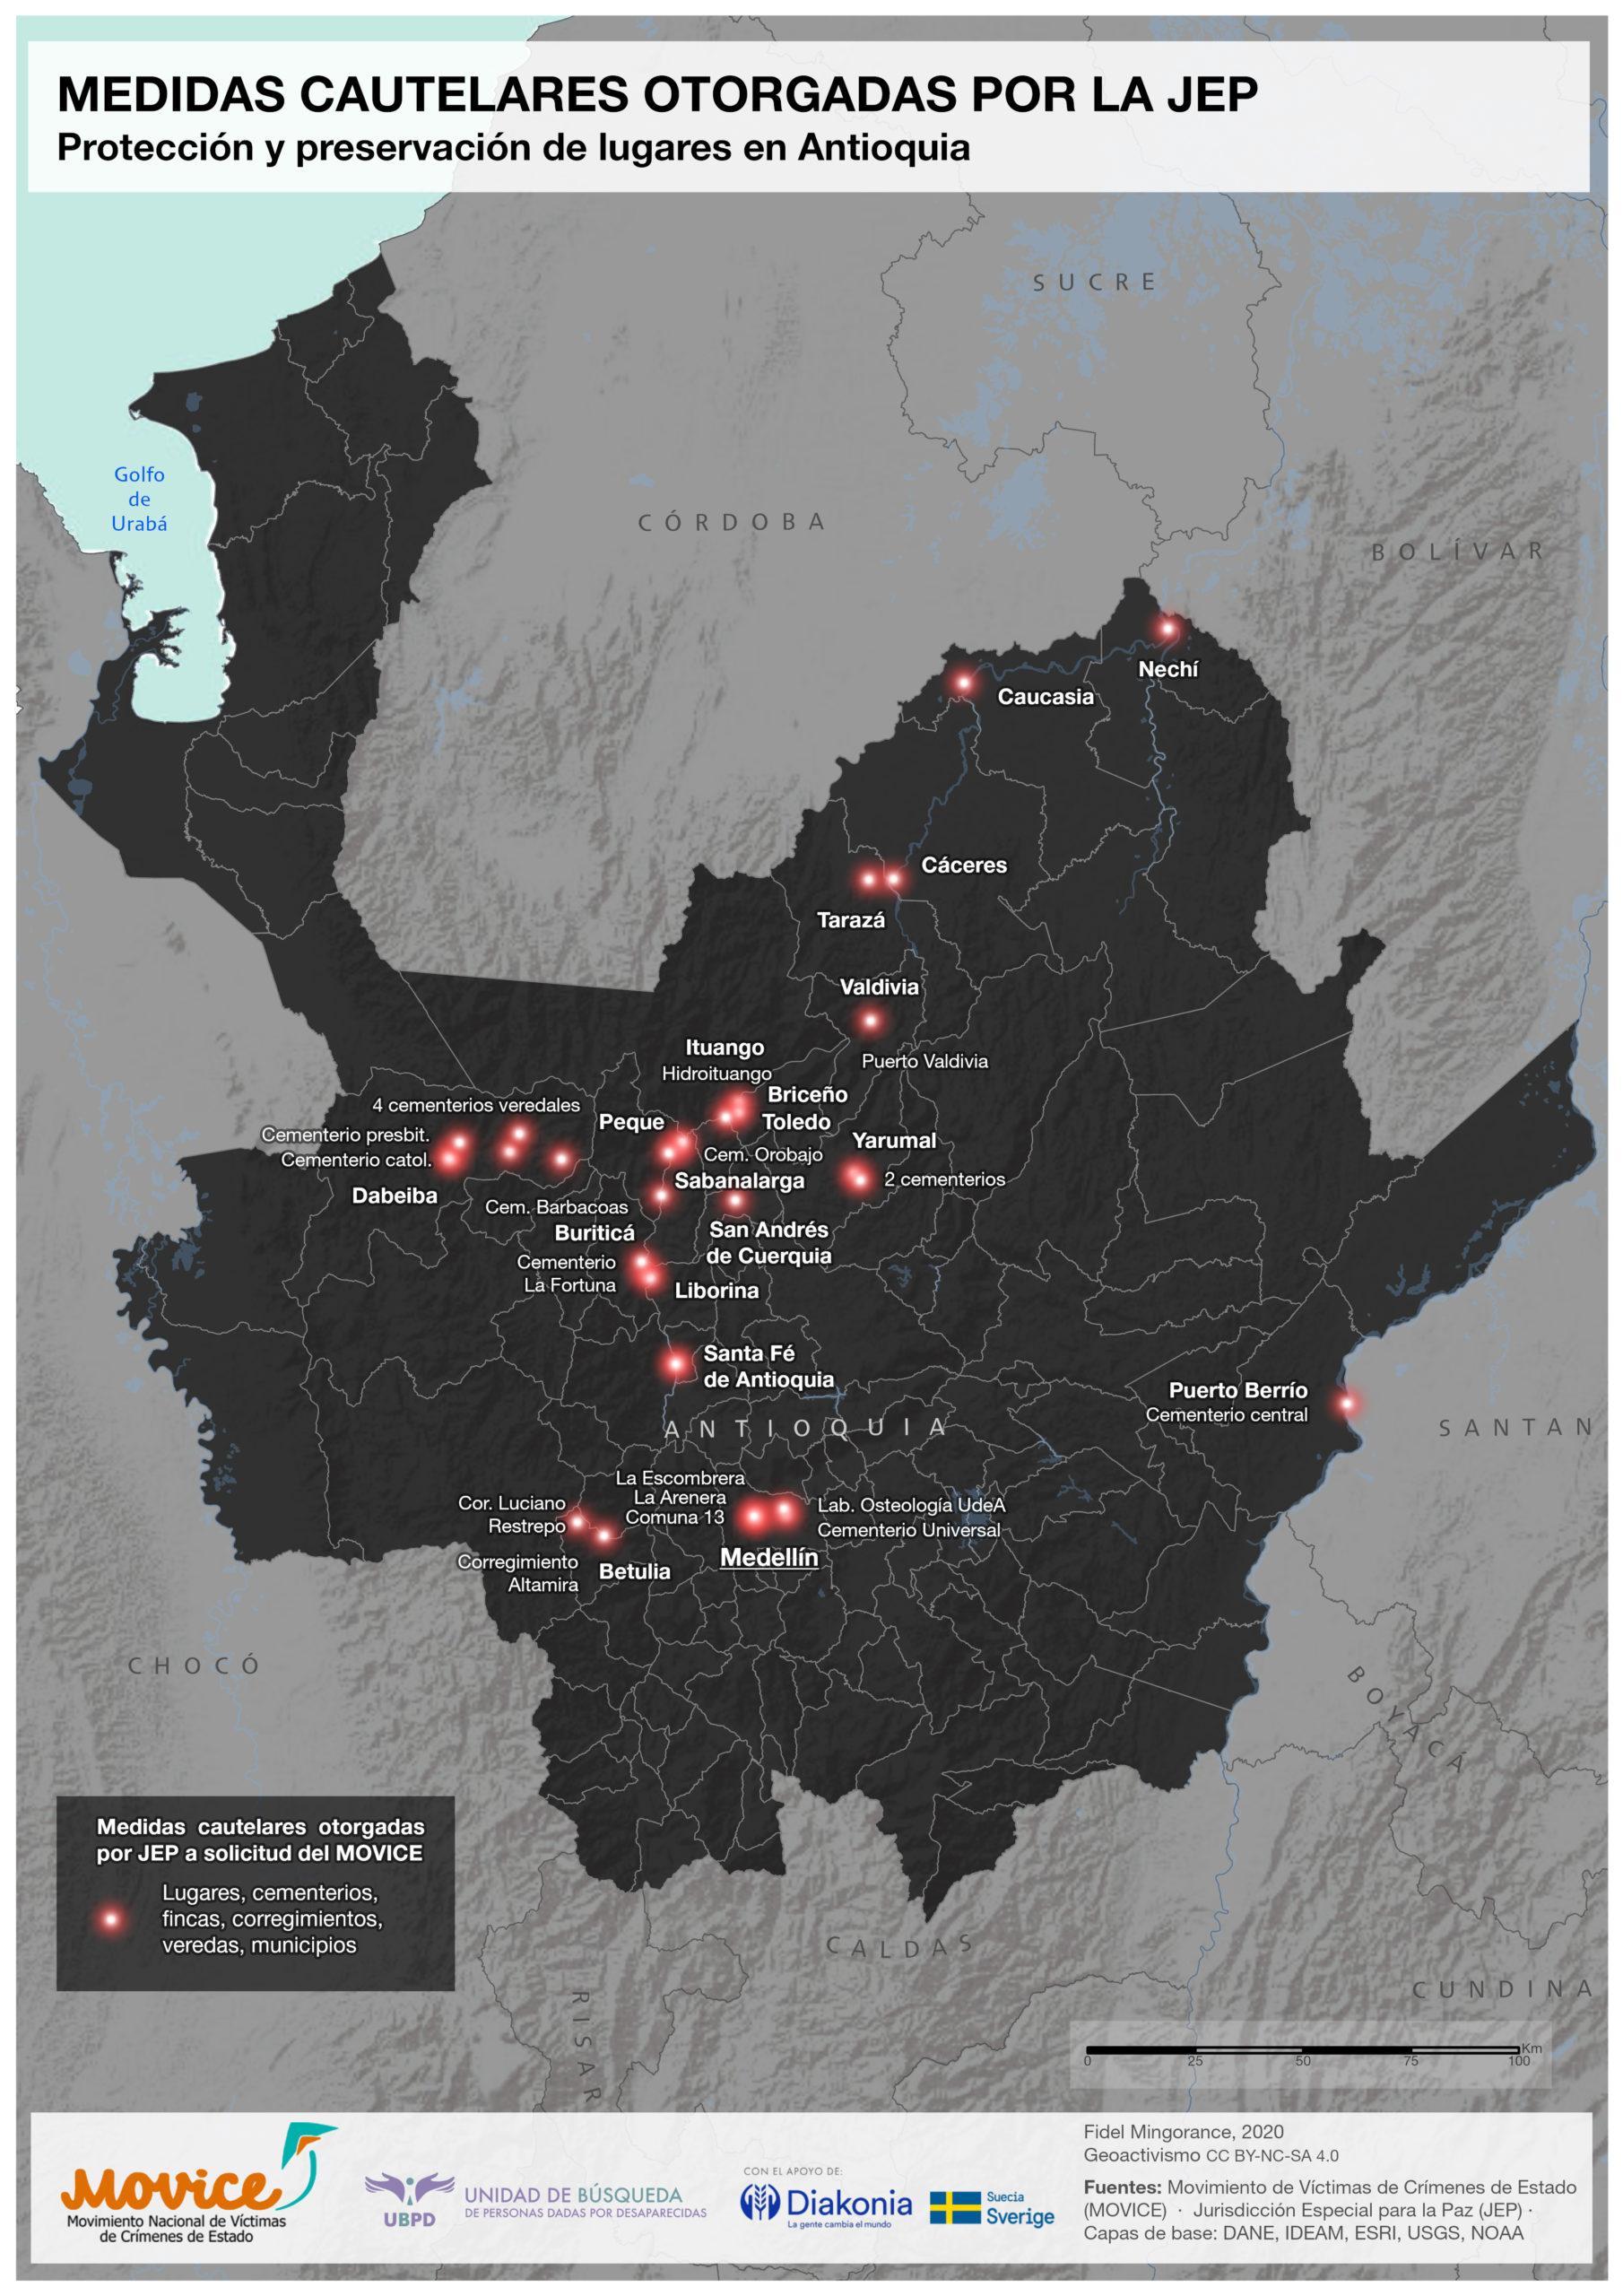 Lugares medidas cautelares JEP Antioquia